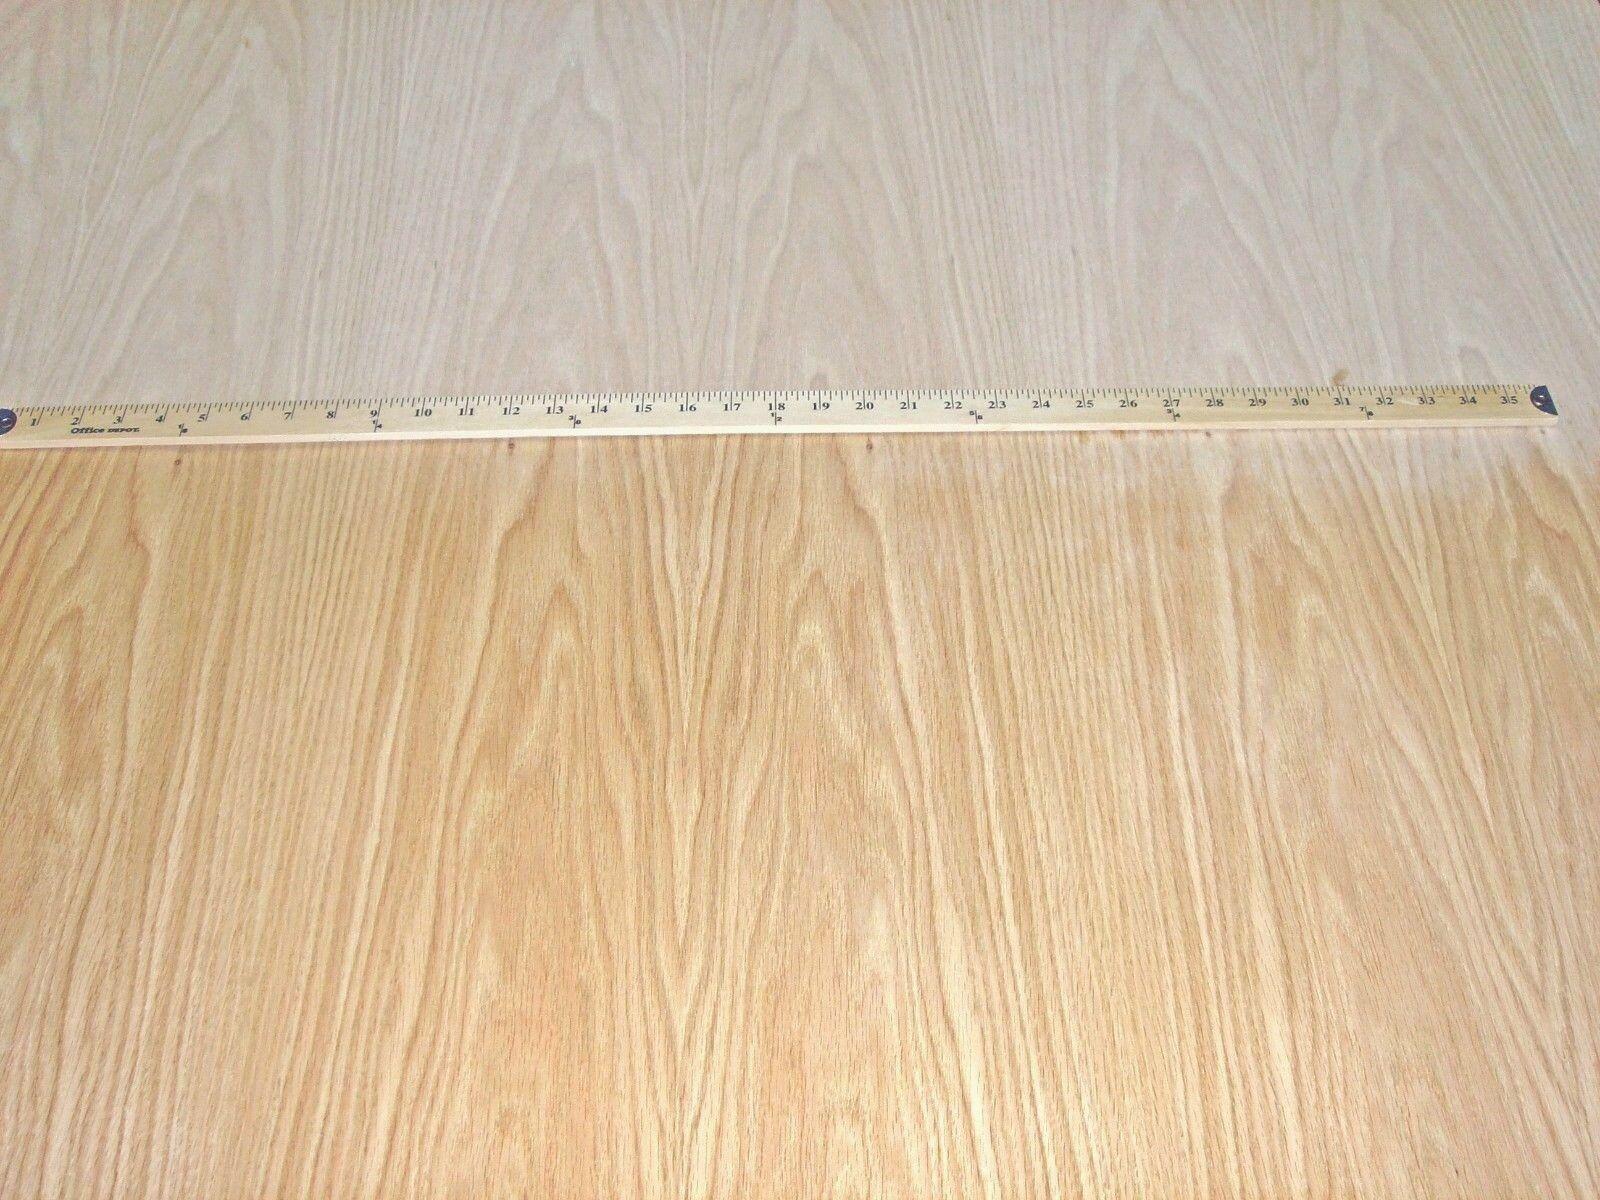 "Red Oak Wood Veneer 24"" X 48"" With 3m Peel and Stick Adhesive Backer"